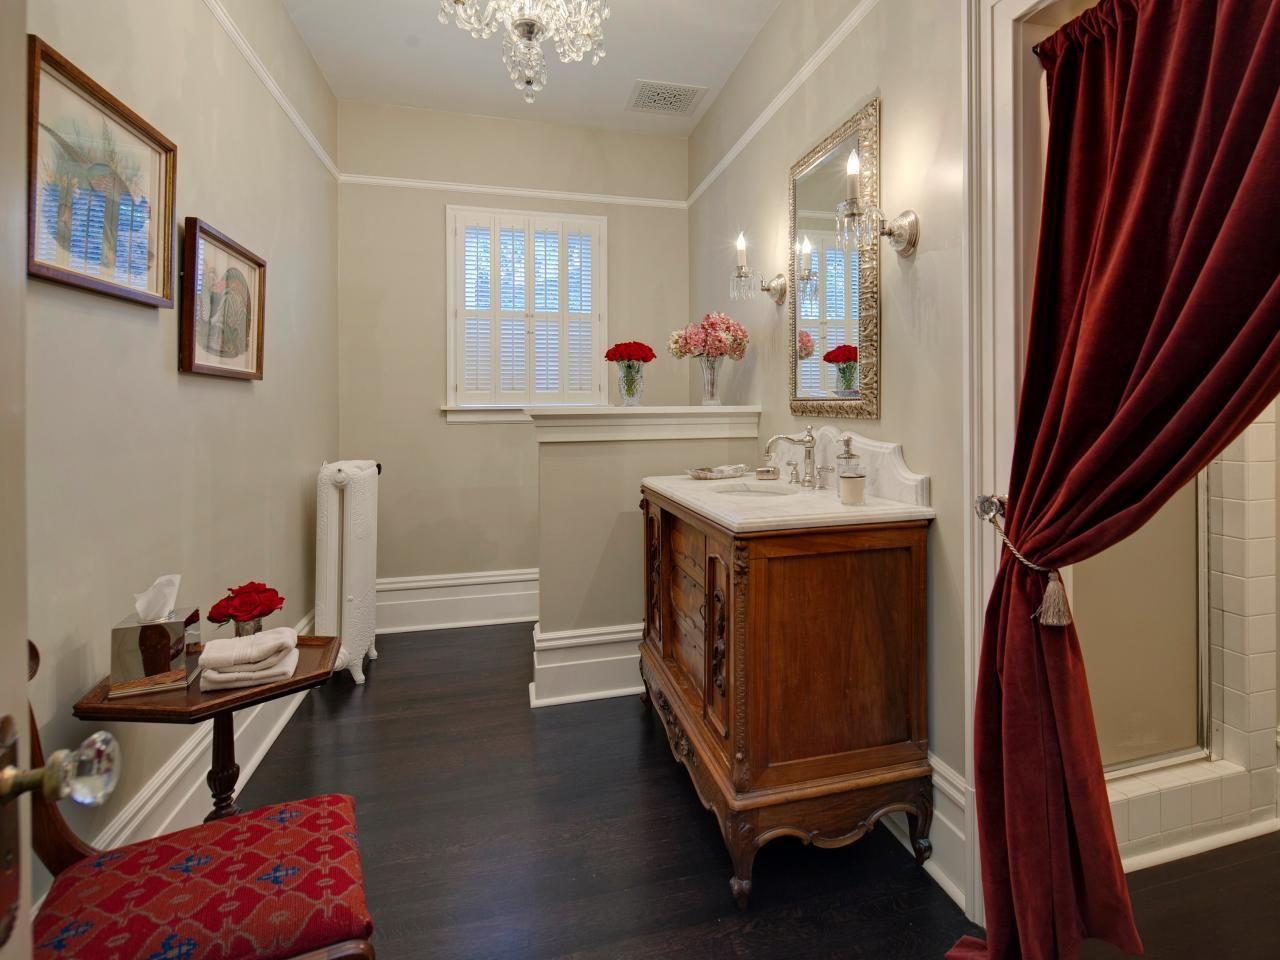 Upcycled And OneofaKind Bathroom Vanities Diy Bathroom - Dresser turned bathroom vanity for bathroom decor ideas